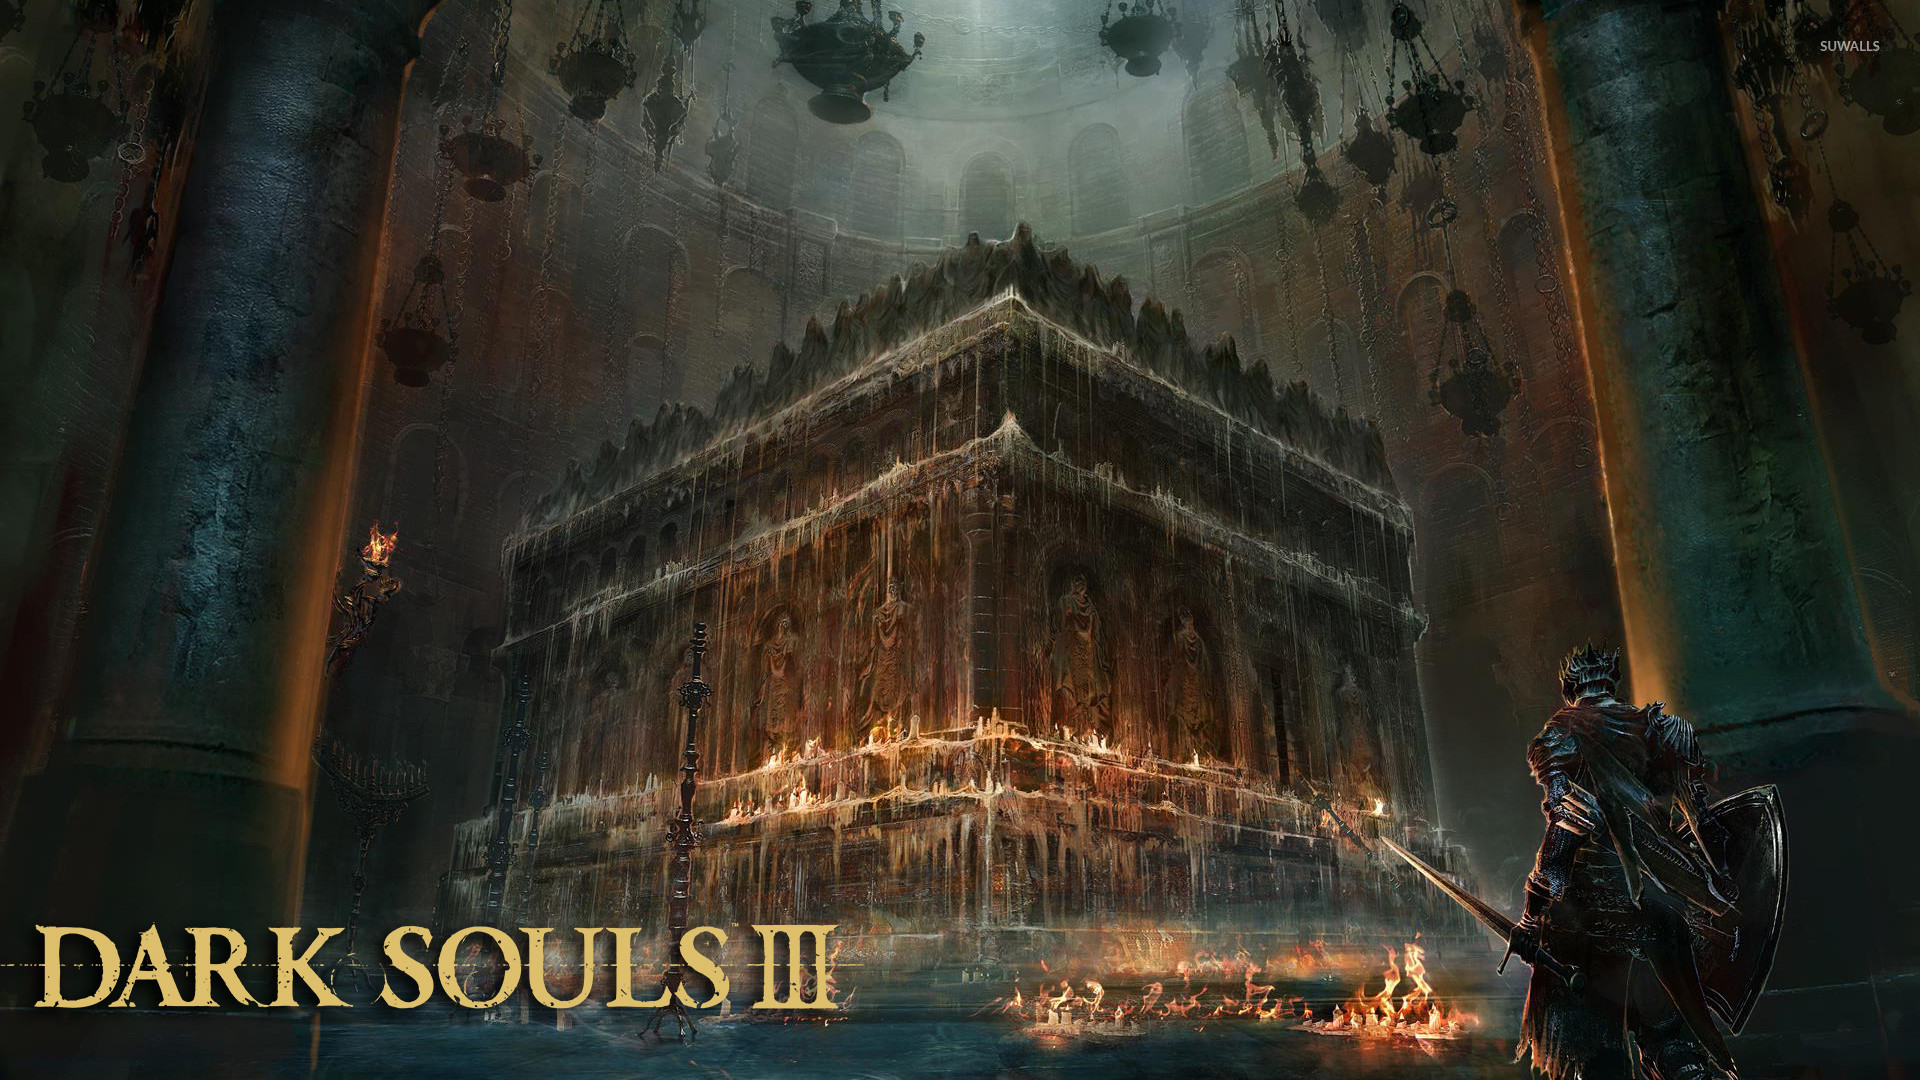 Altar in a church in Dark Souls III wallpaper